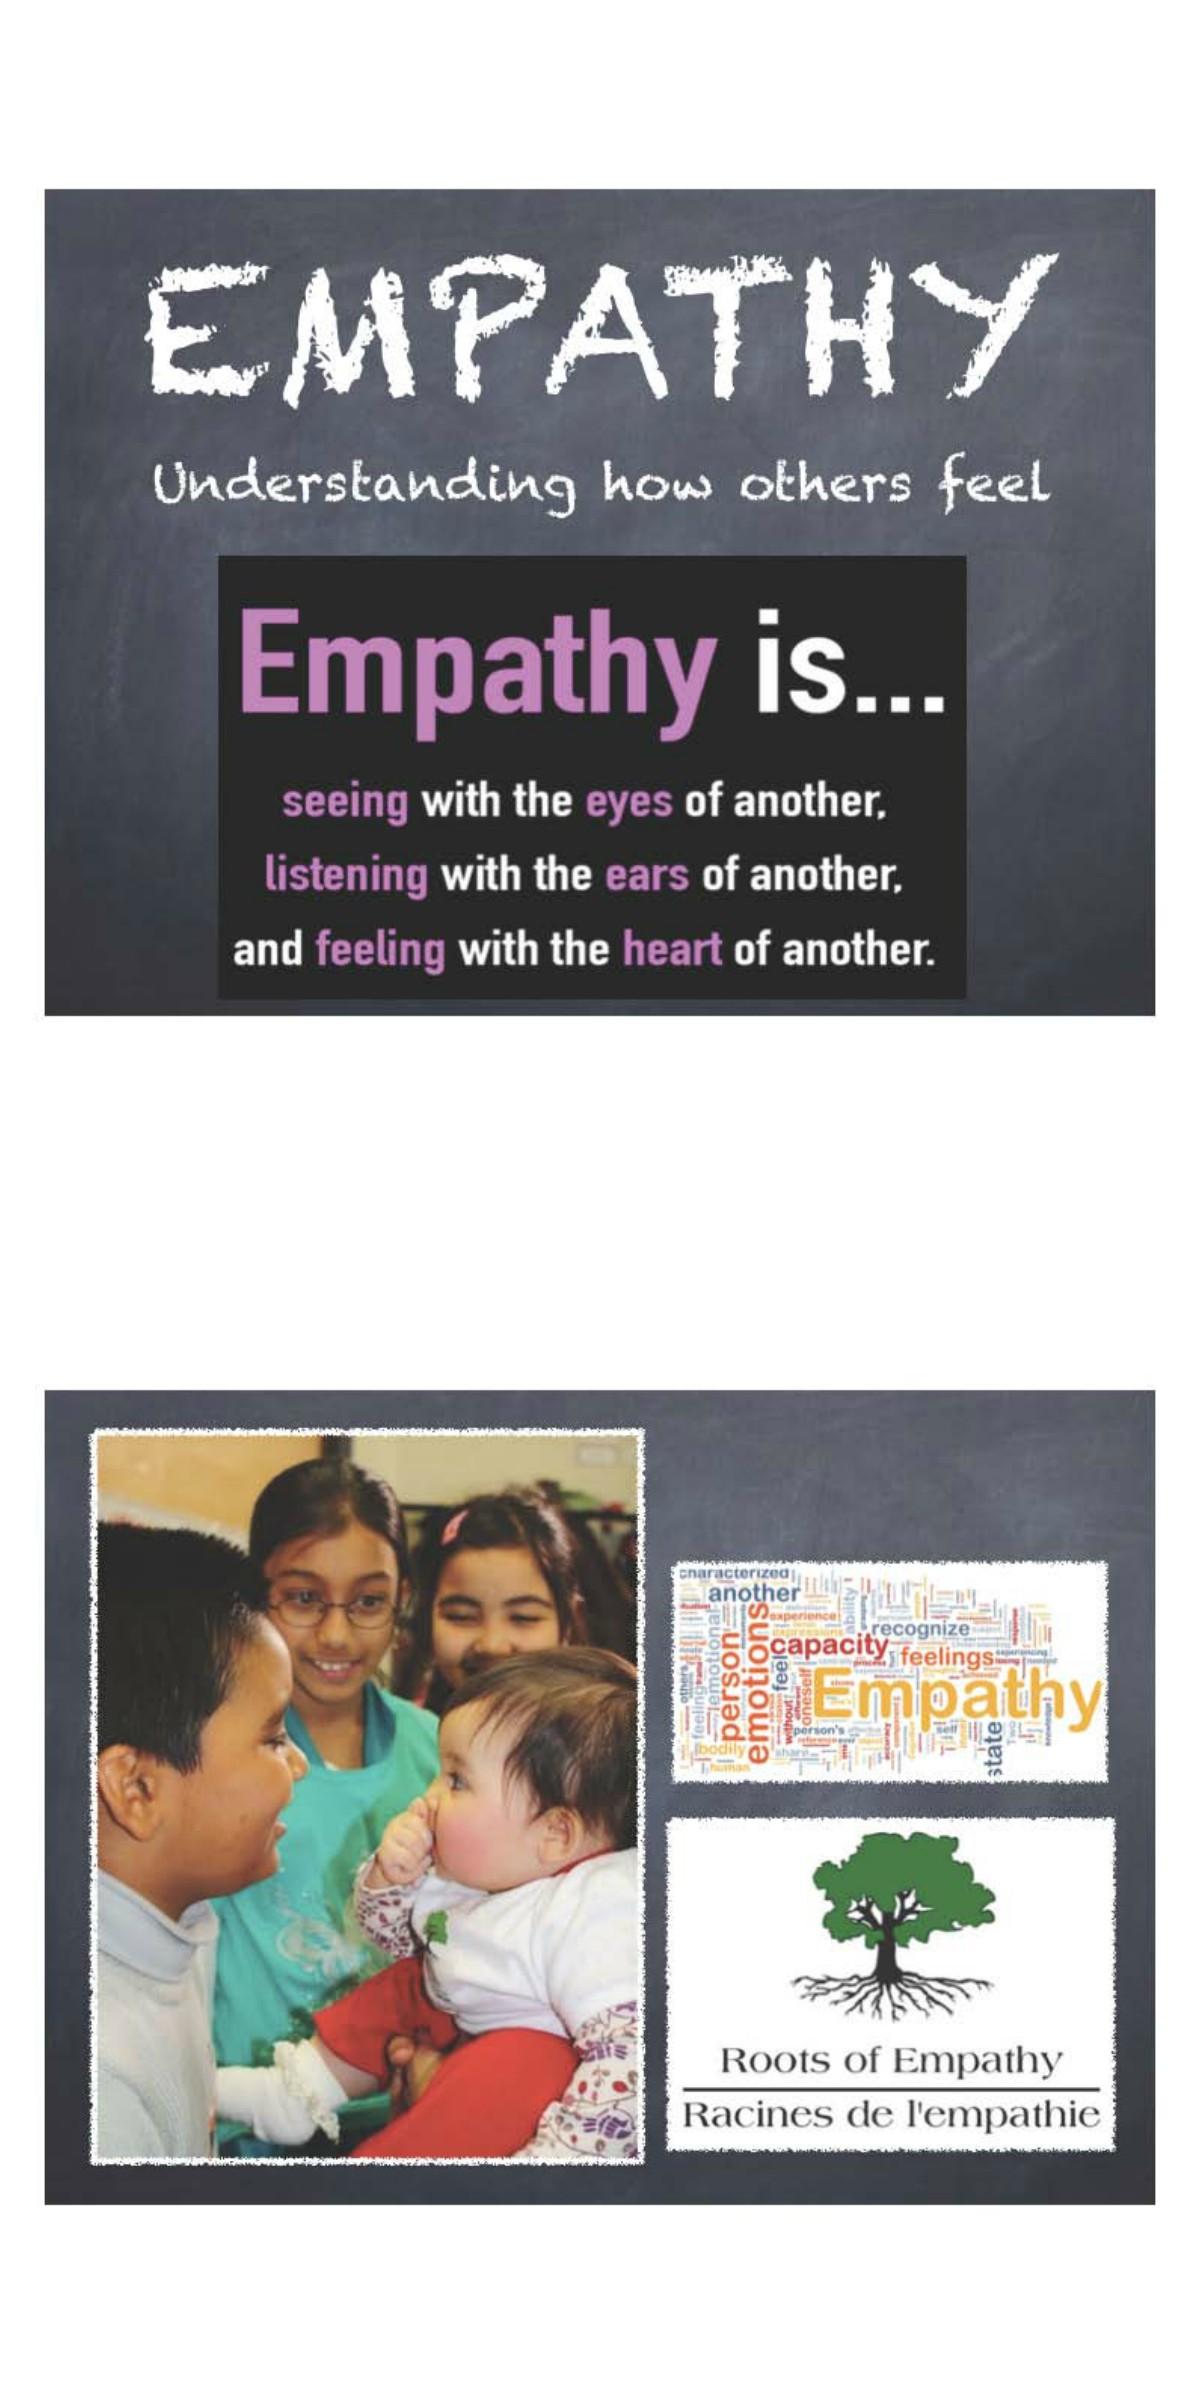 Empathy stitch 2